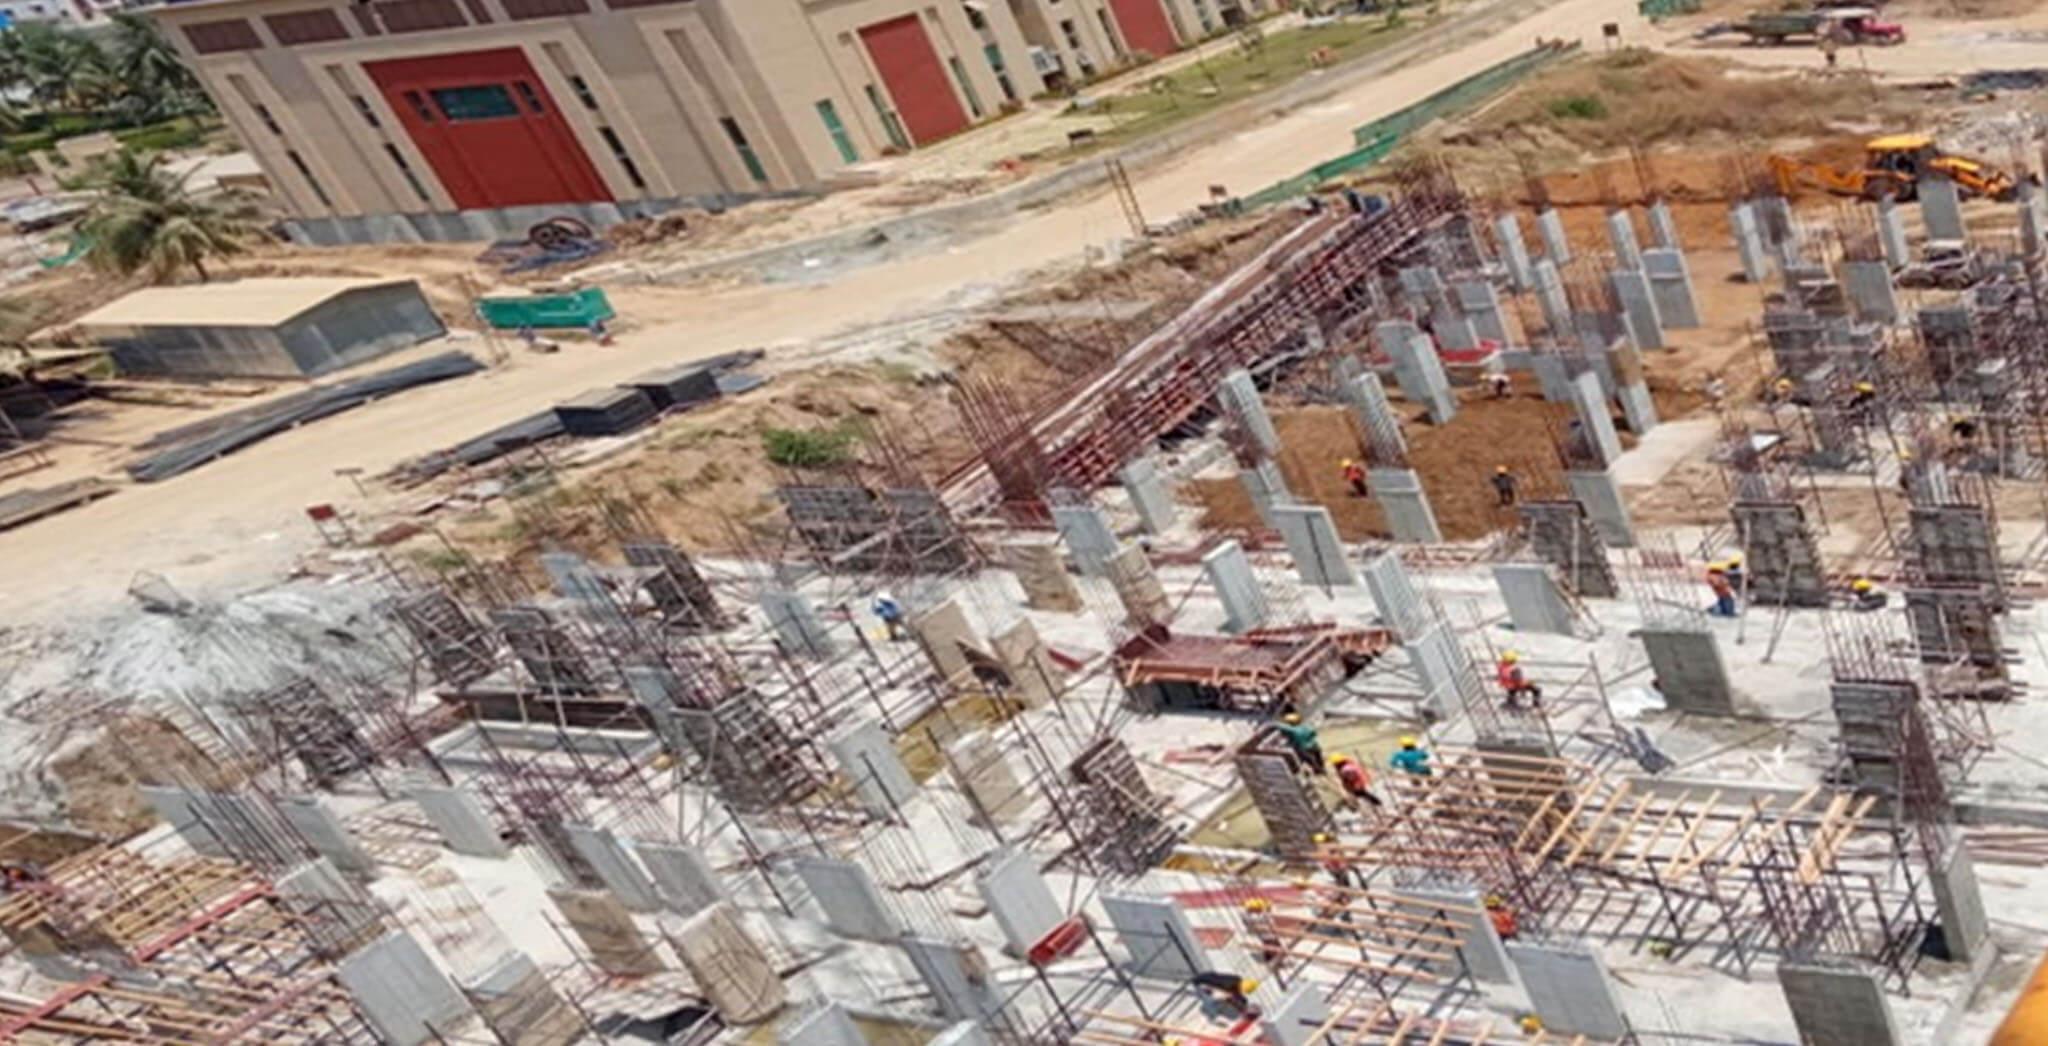 Mar 2021 - Block K: Excavation completed; Foundational work-in-progress